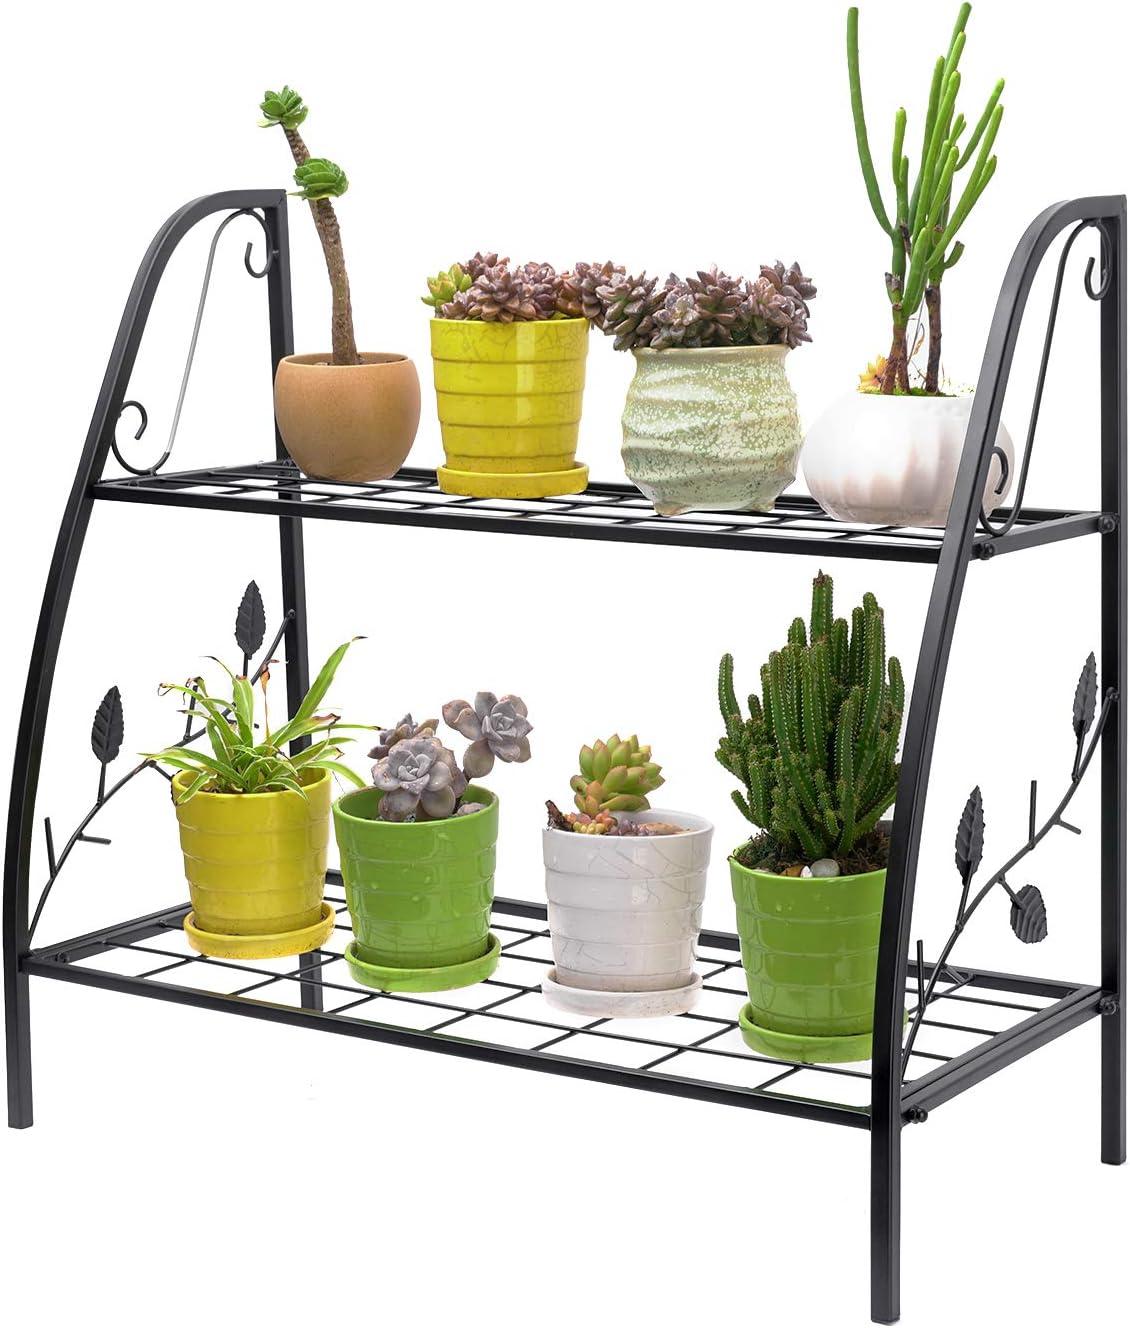 SONGXIN 2-Tier Metal Plant Stand - Plant Flower Display Rack Stand Shelf Multifunction Storage Flower Pot Holder Organizer Rack for Indoor/Outdoor Patio Garden Balcony Yard